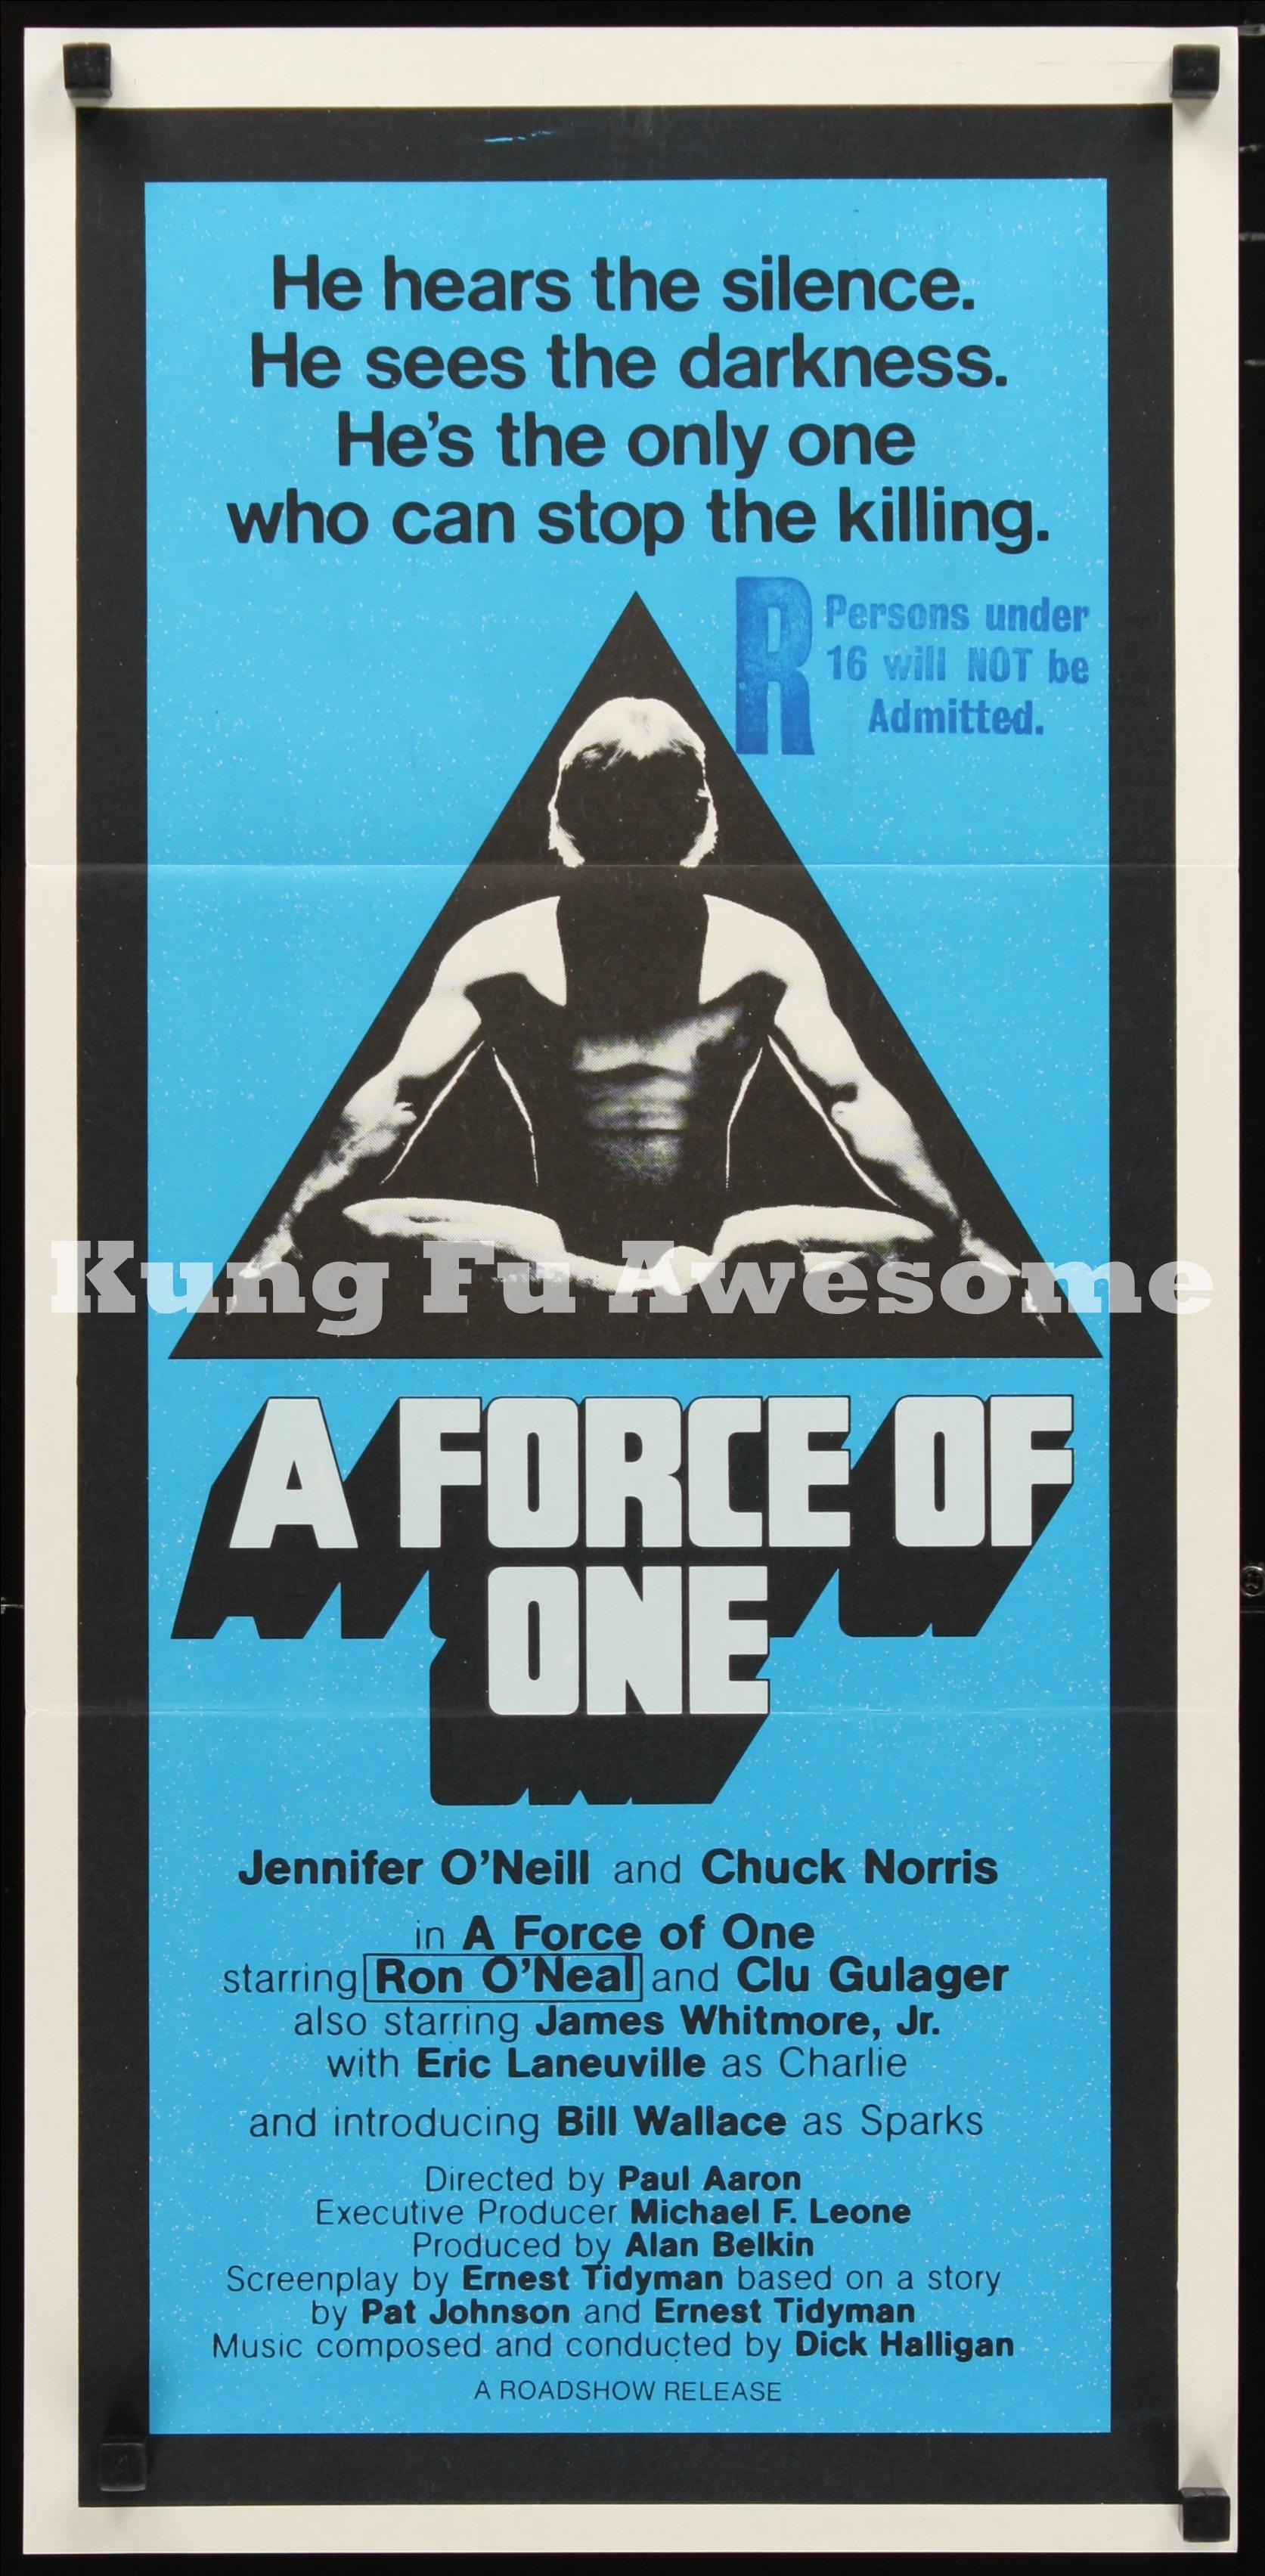 australian_db_force_of_one_MF01467_L.jpg